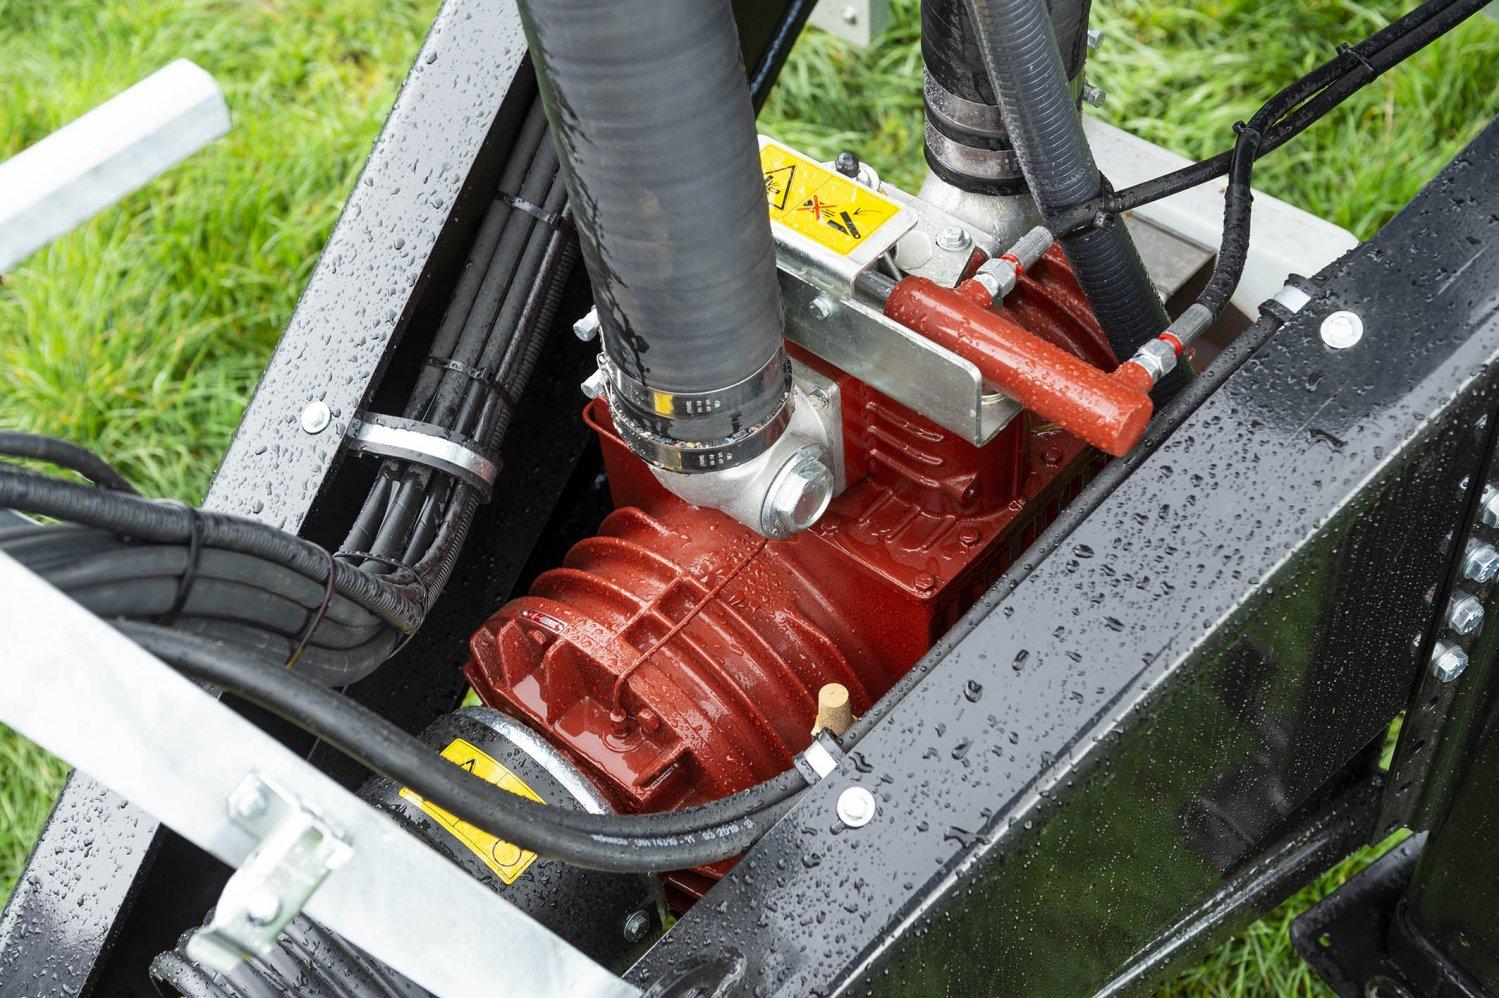 Güllewagen-Kompressor-Jurop Kompressor PN.jpg